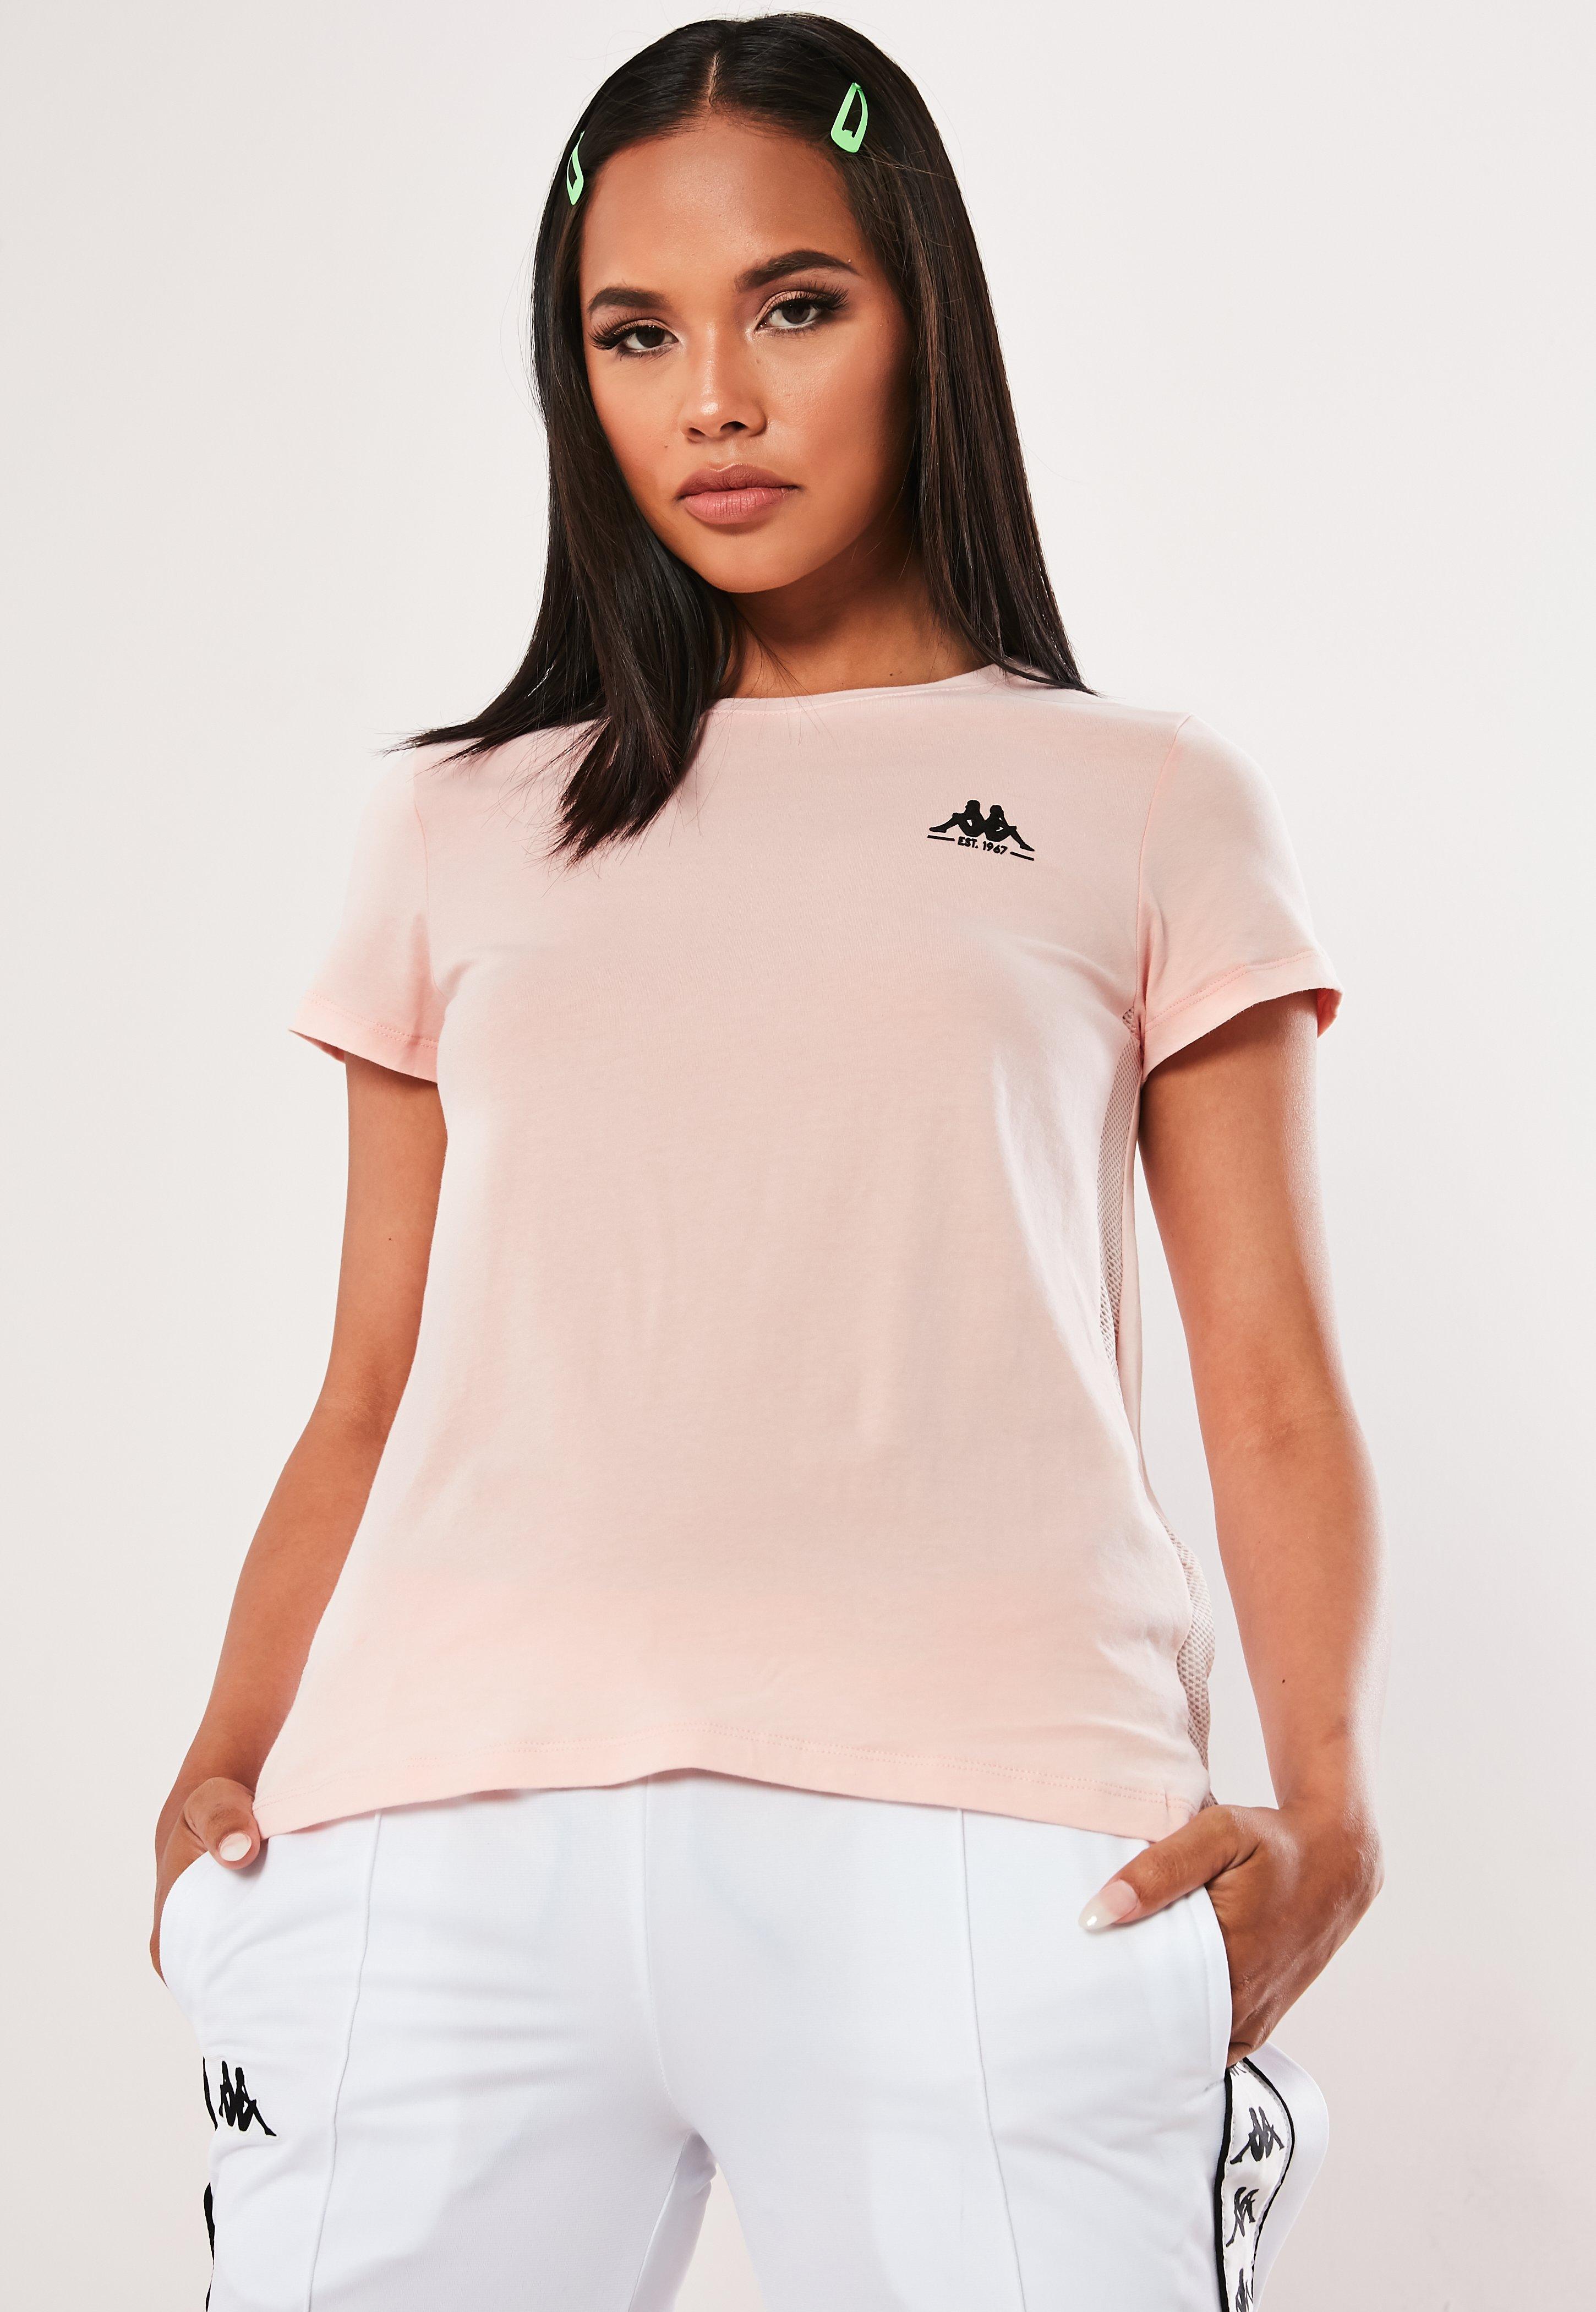 2a4f805f4c Kappa Pink Mesh Side T Shirt